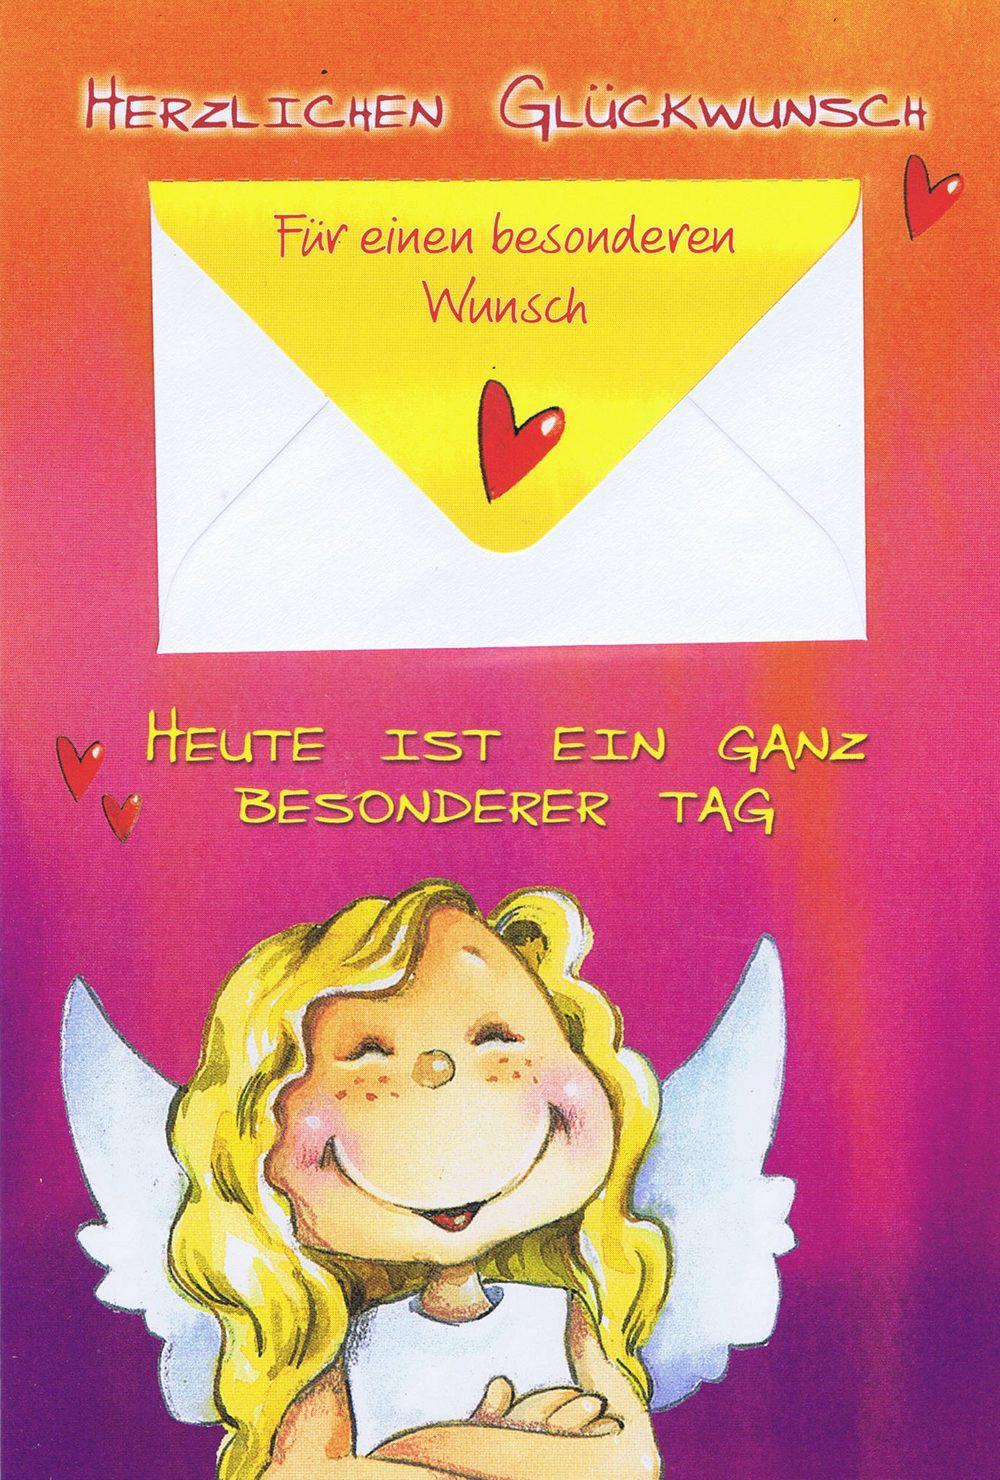 Geburtstagskarten Schutzengel mit Geldkuvert 201270 | Kartenwichtel.de